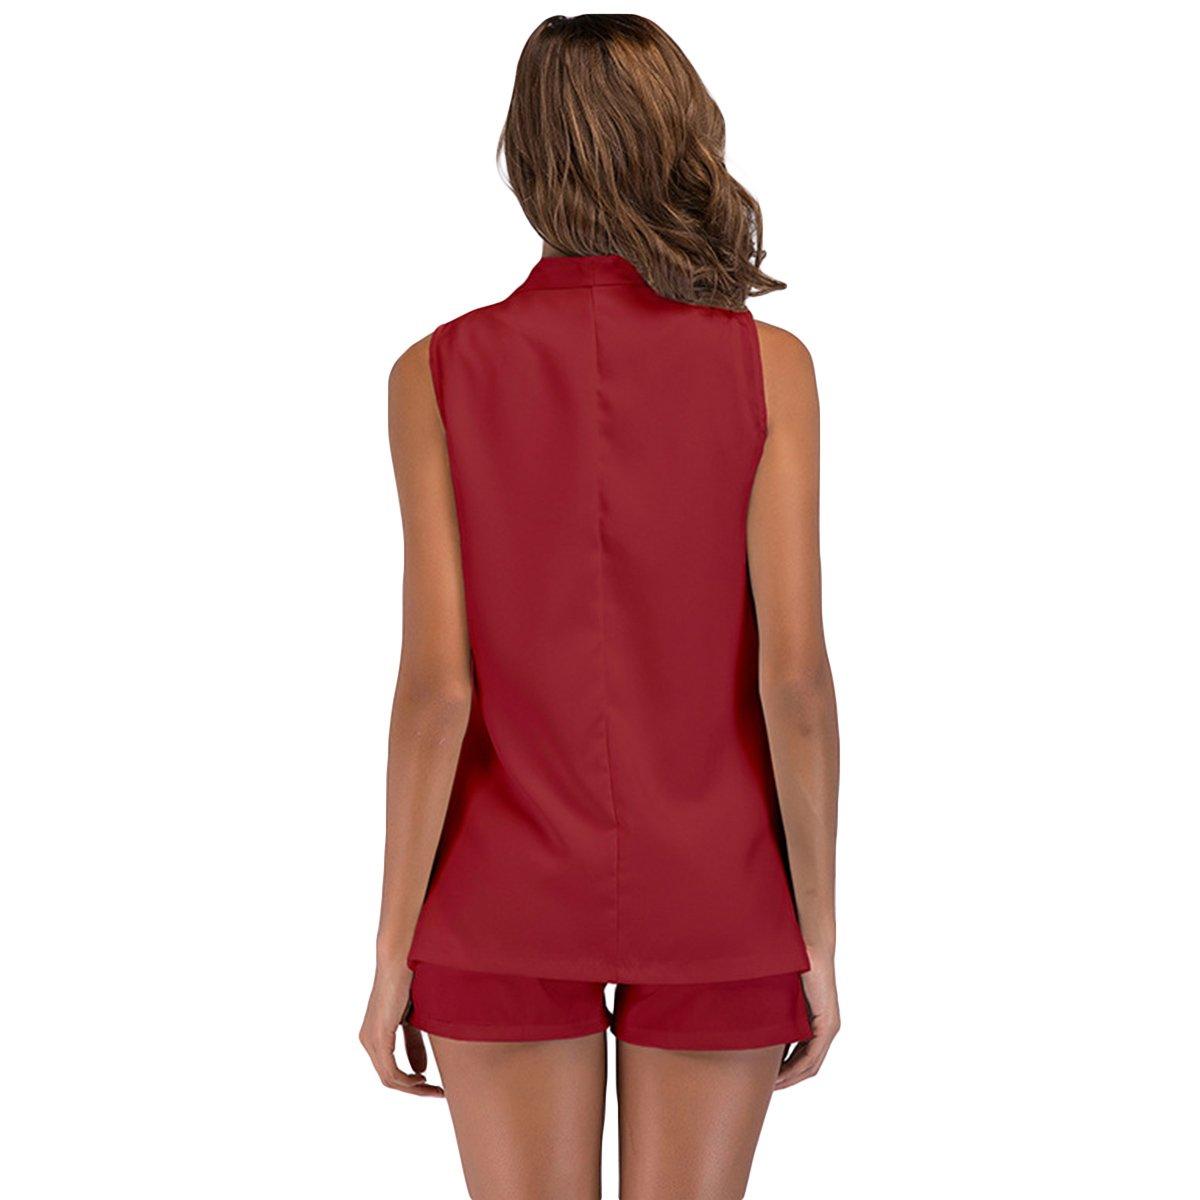 Women Summer Work Business Three Pieces Suits Tank Top Shorts Sleeveless Blazer